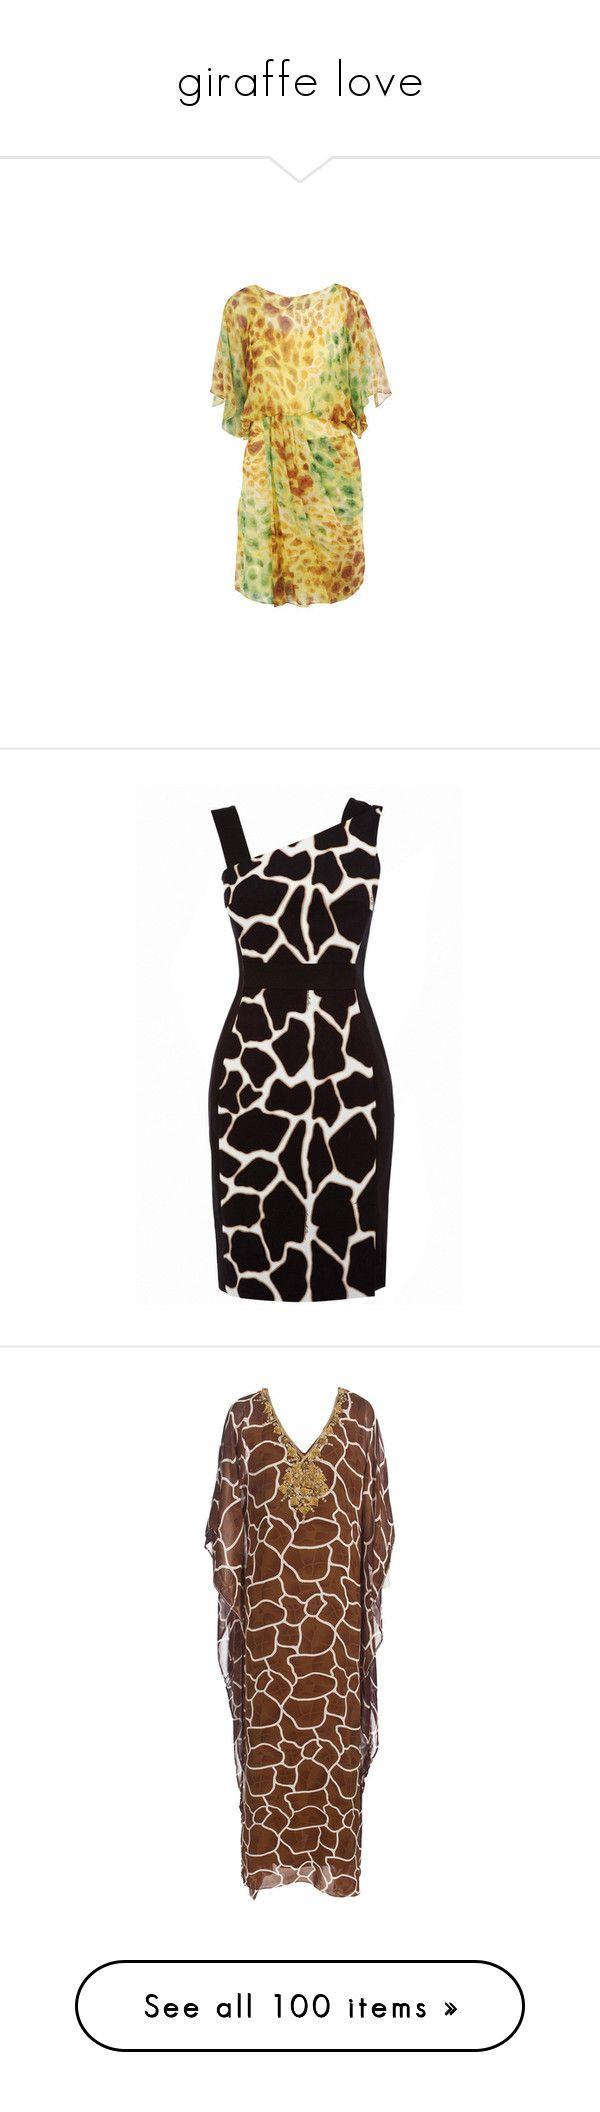 """giraffe love"" by aannggiiee ❤ liked on Polyvore featuring dresses, diane, furstenberg, green, von, ruffle sleeve dress, diane von furstenberg dress, green summer dress, beige summer dress and flutter sleeve dress"